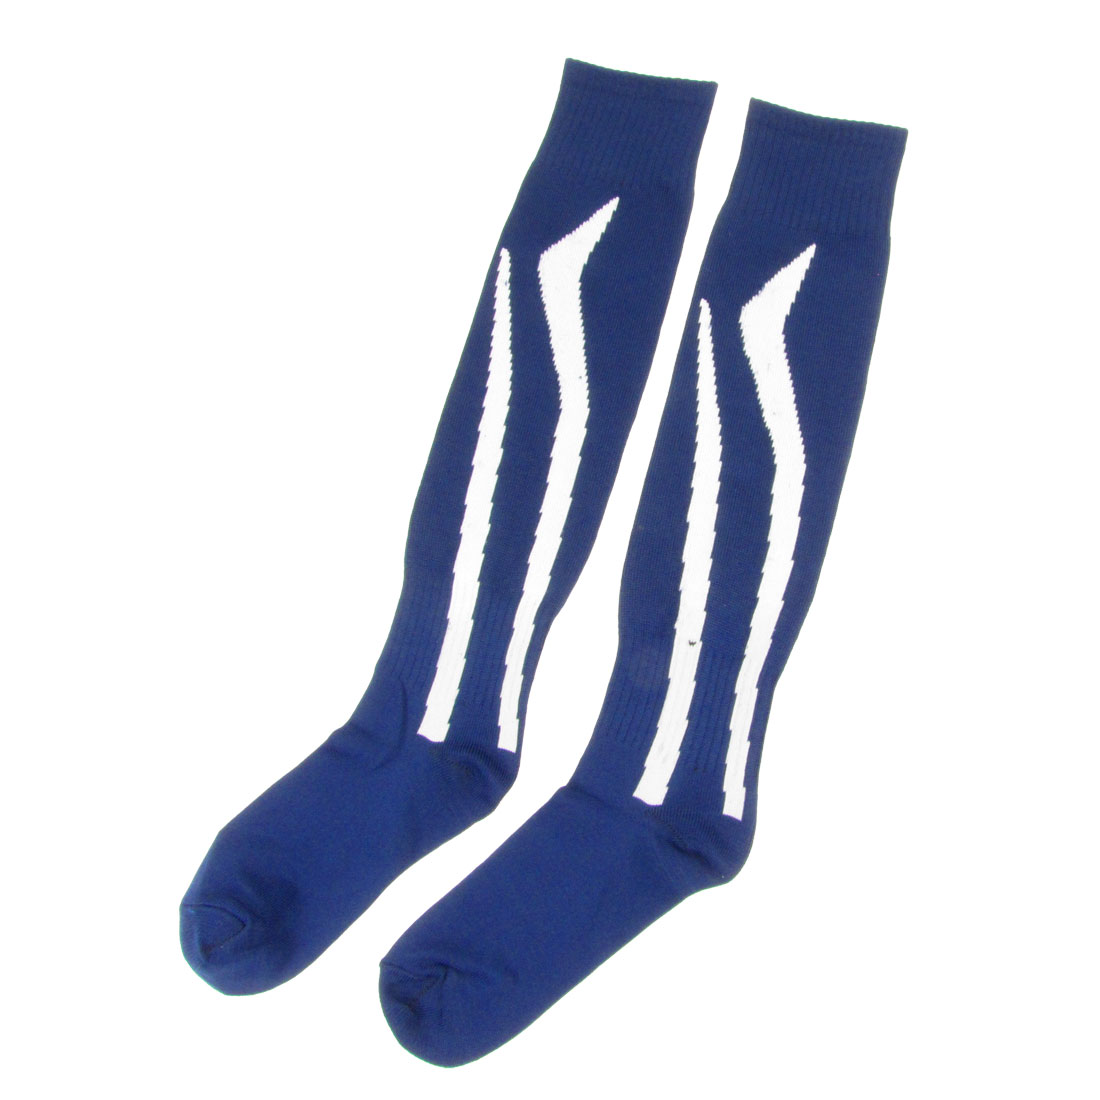 Pair Men Lady White Leg Pattern Spandex Sports Rugby Football Socks Dark Blue